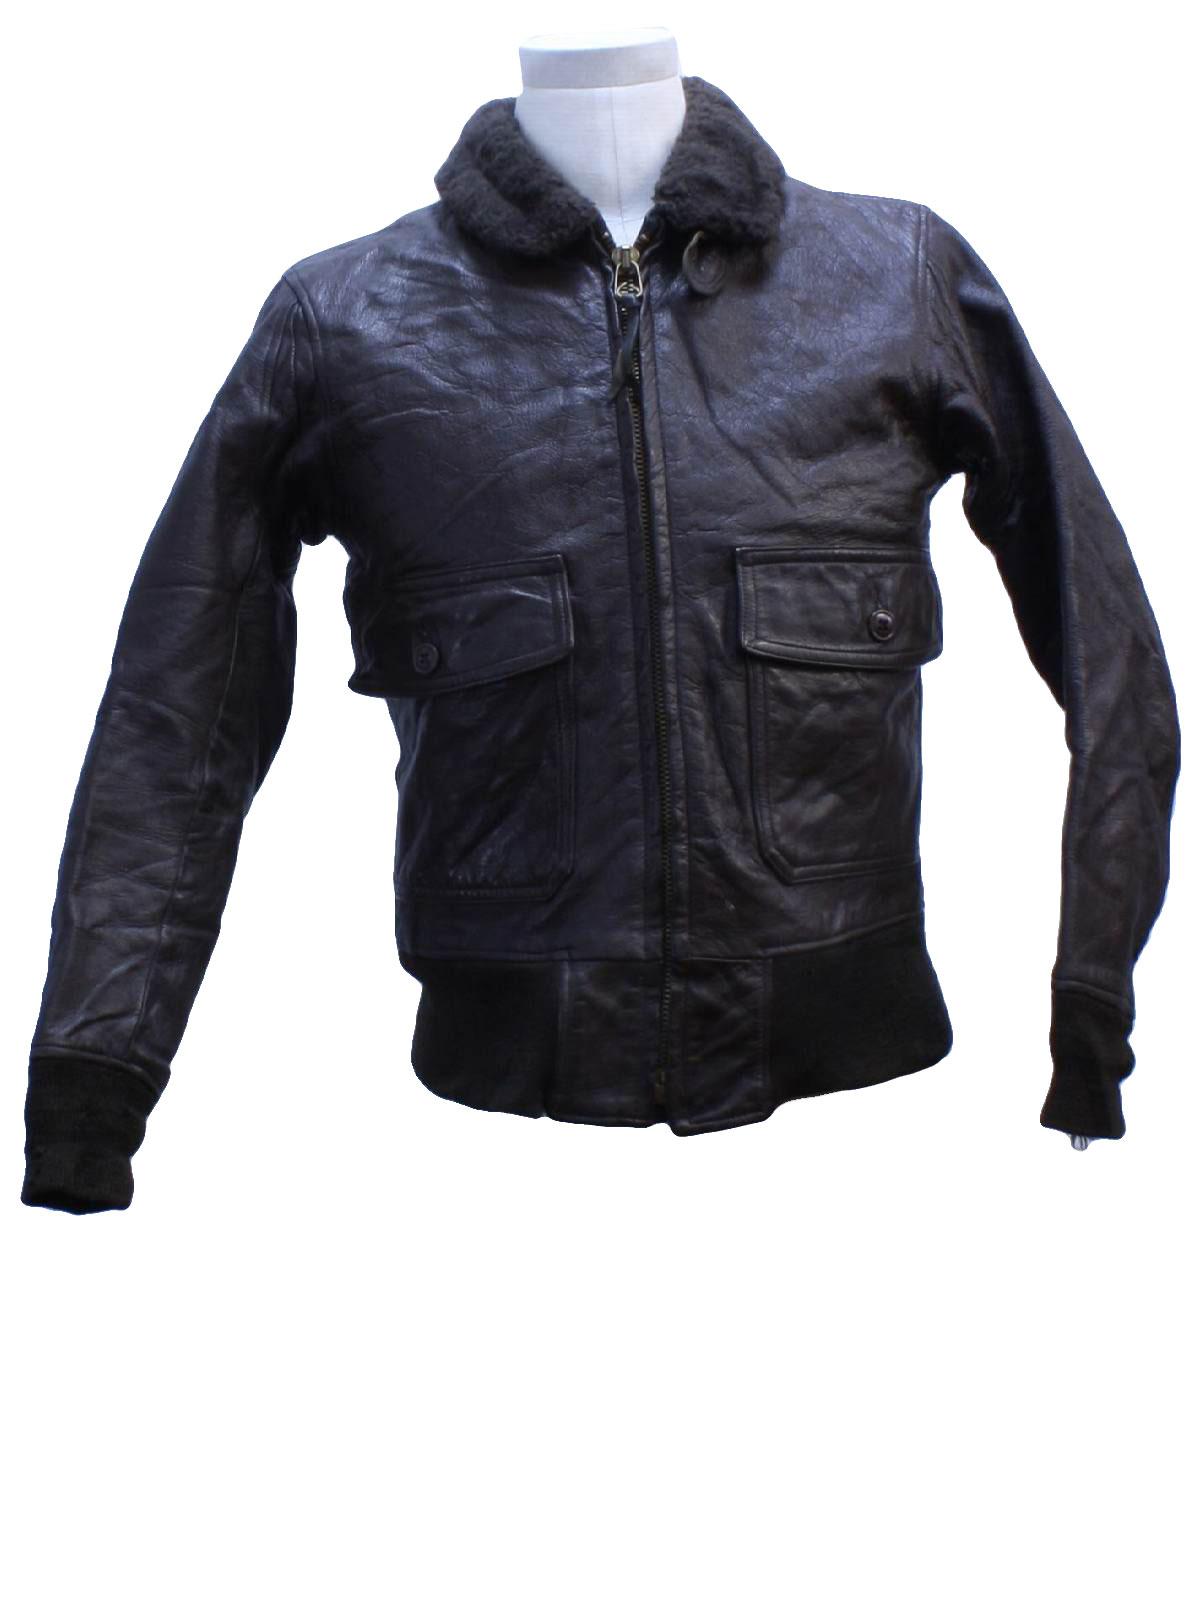 International Military Supply 60's Vintage Leather Jacket: 60s ...